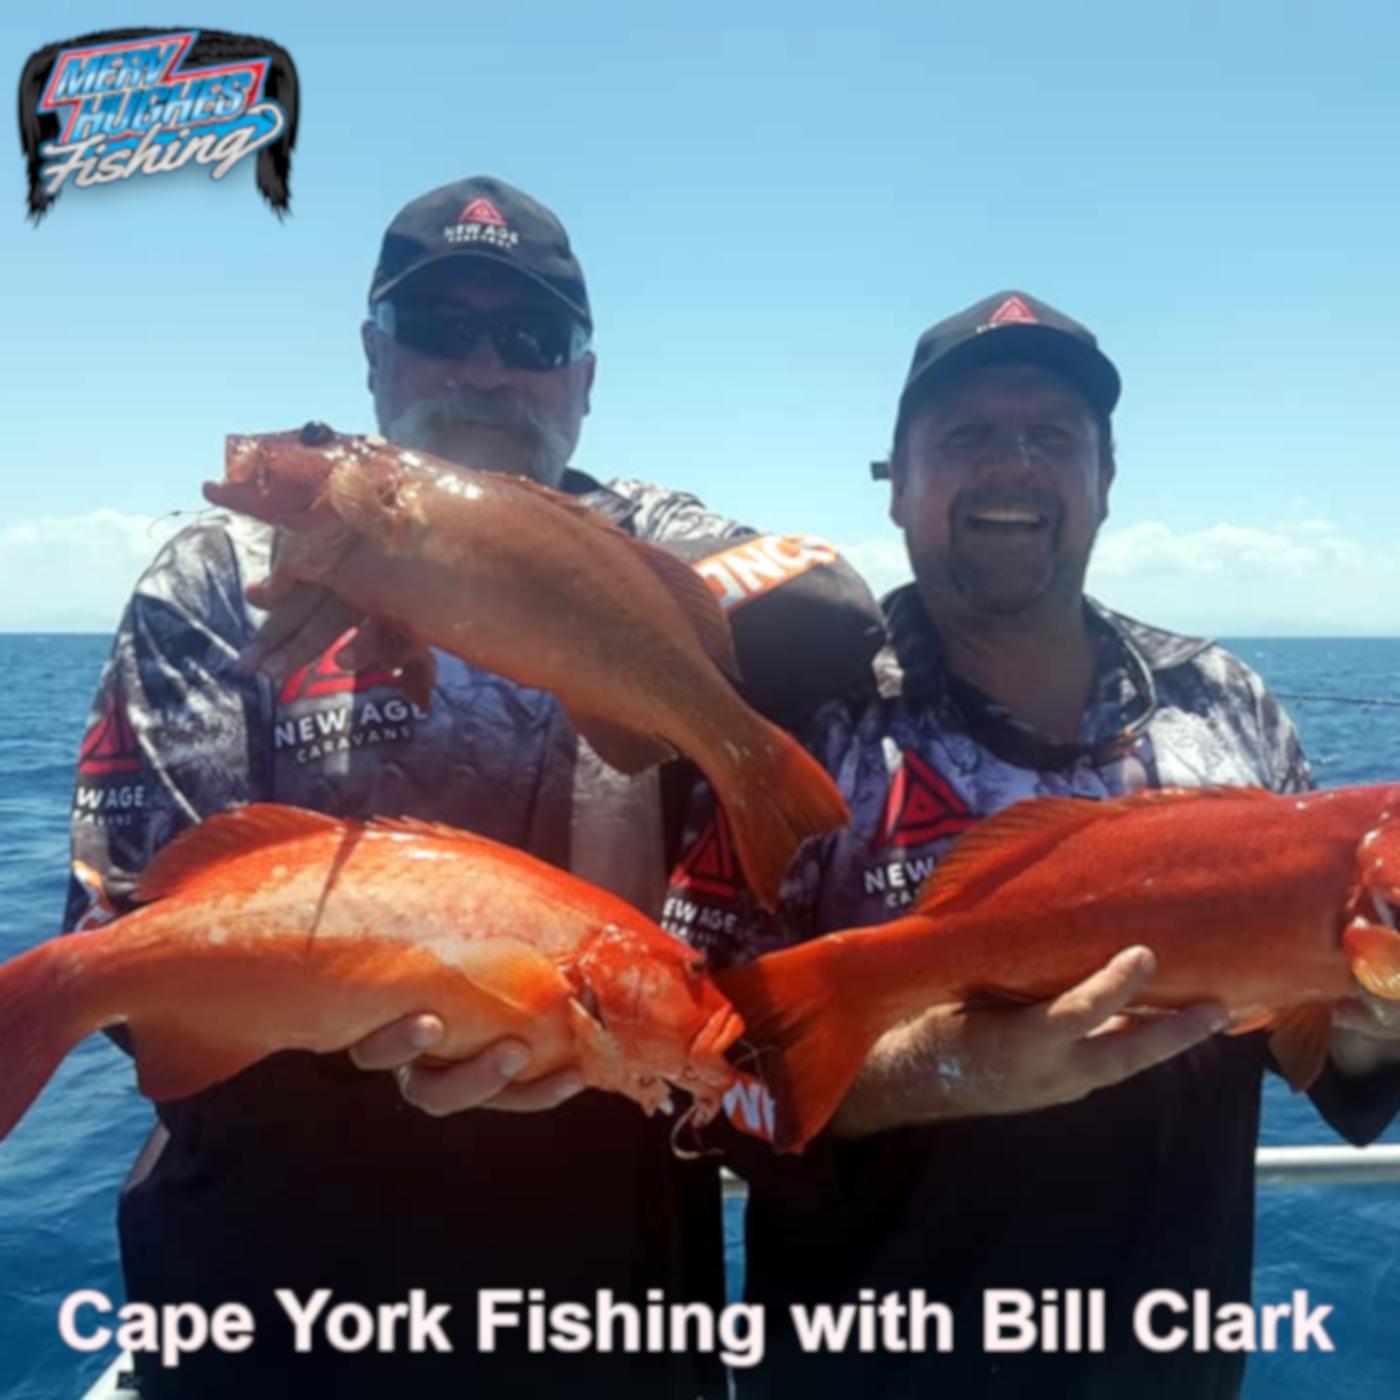 Cape York Fishing with Bill Clark